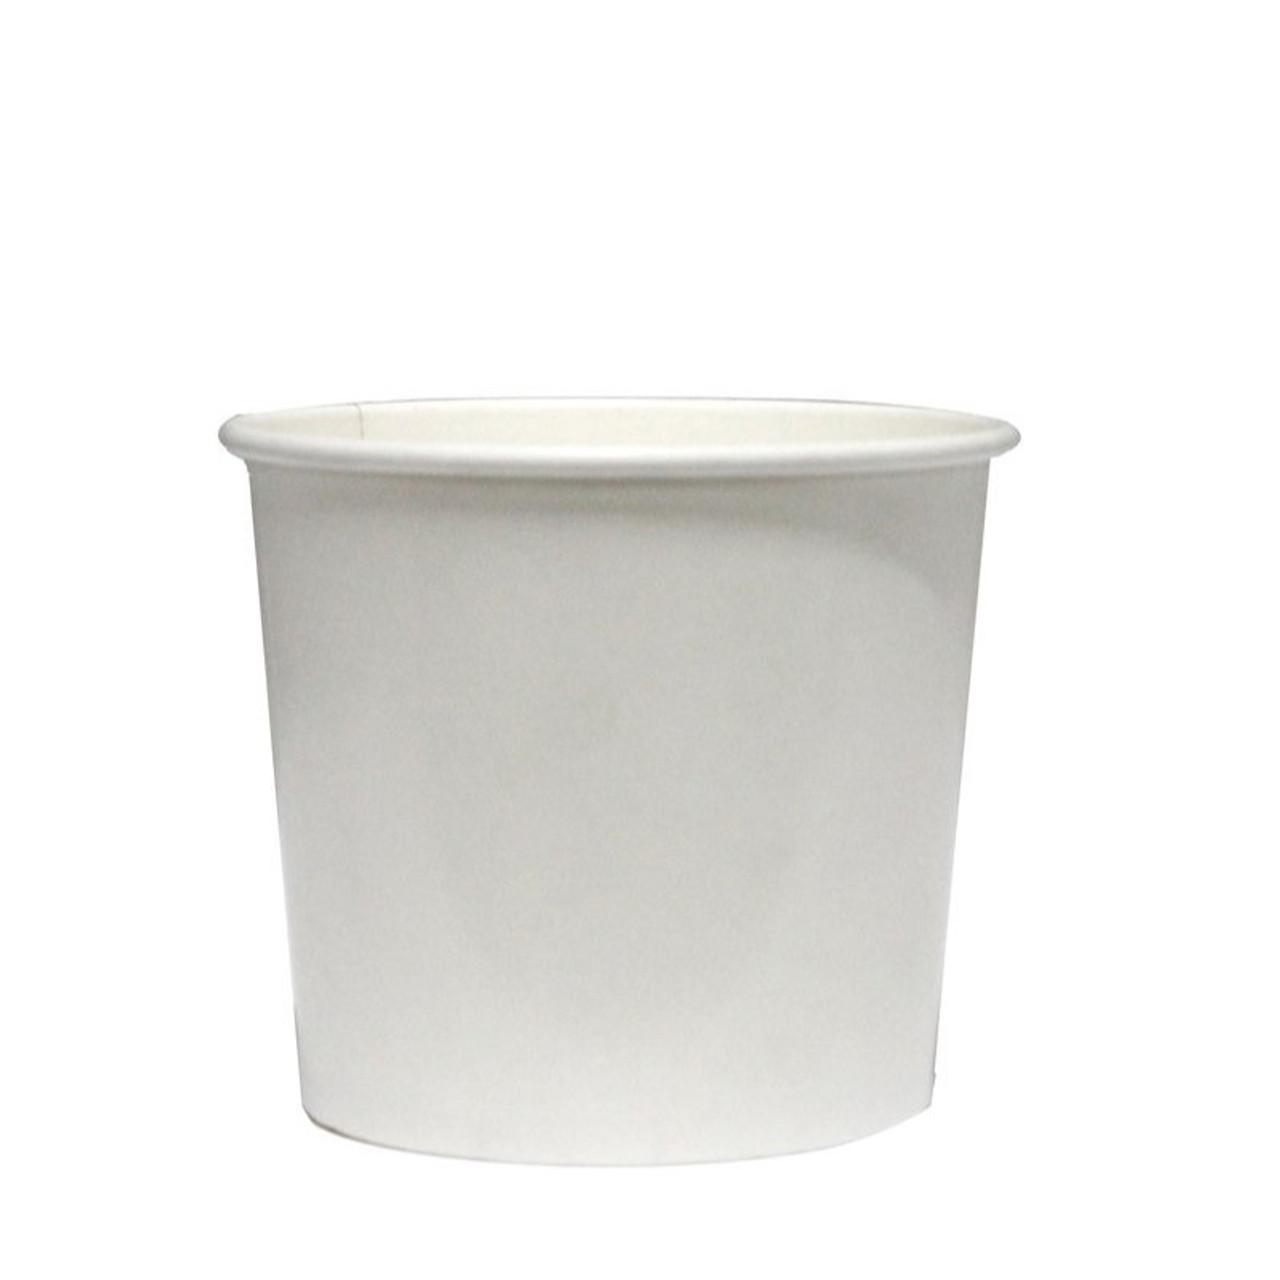 White Paper Food Bowl 1000ml Unicorn Kitchenware